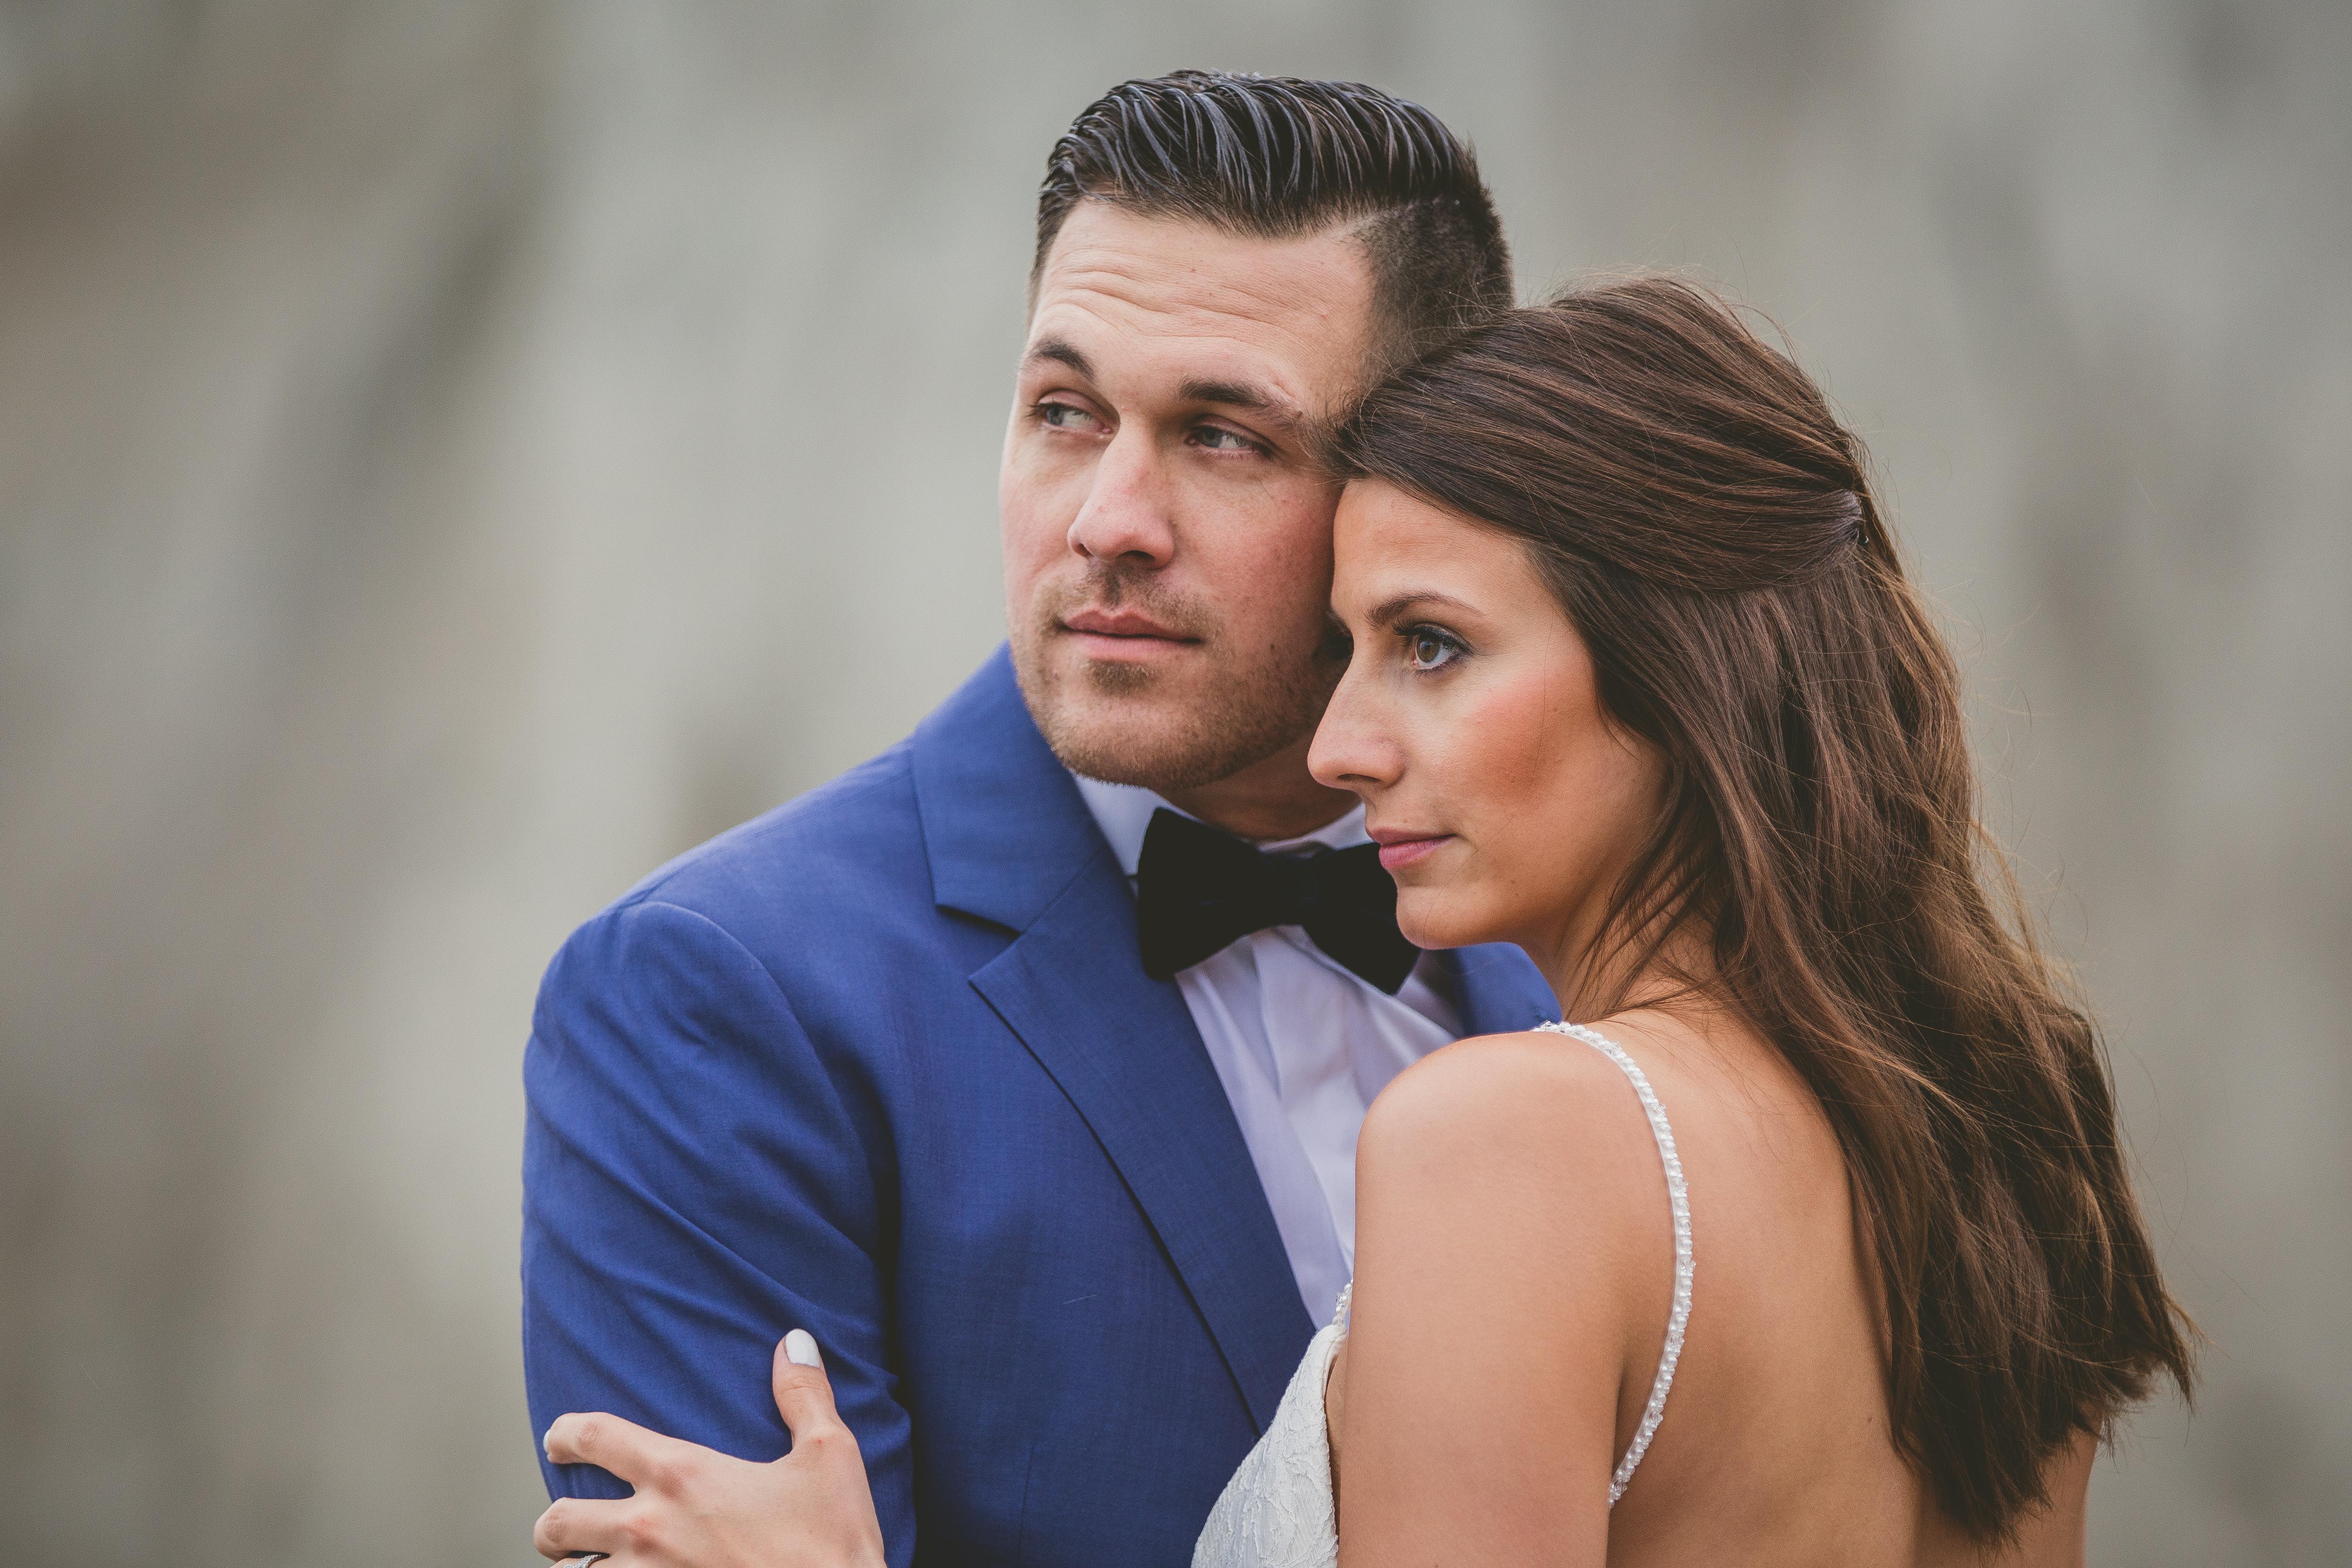 scarborough bluffs wedding photos 52 - Scarborough Bluffs Wedding Photos